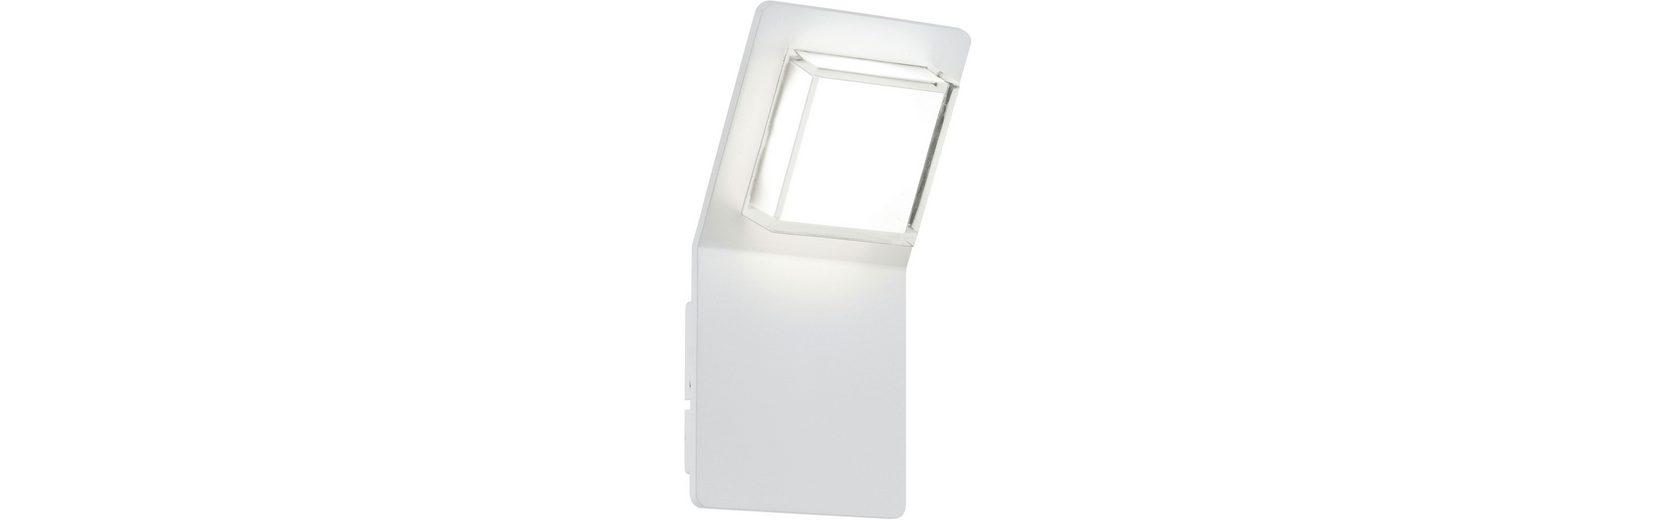 Eglo LED Außenleuchte, 1 flg., Wandleuchte, »Pias«